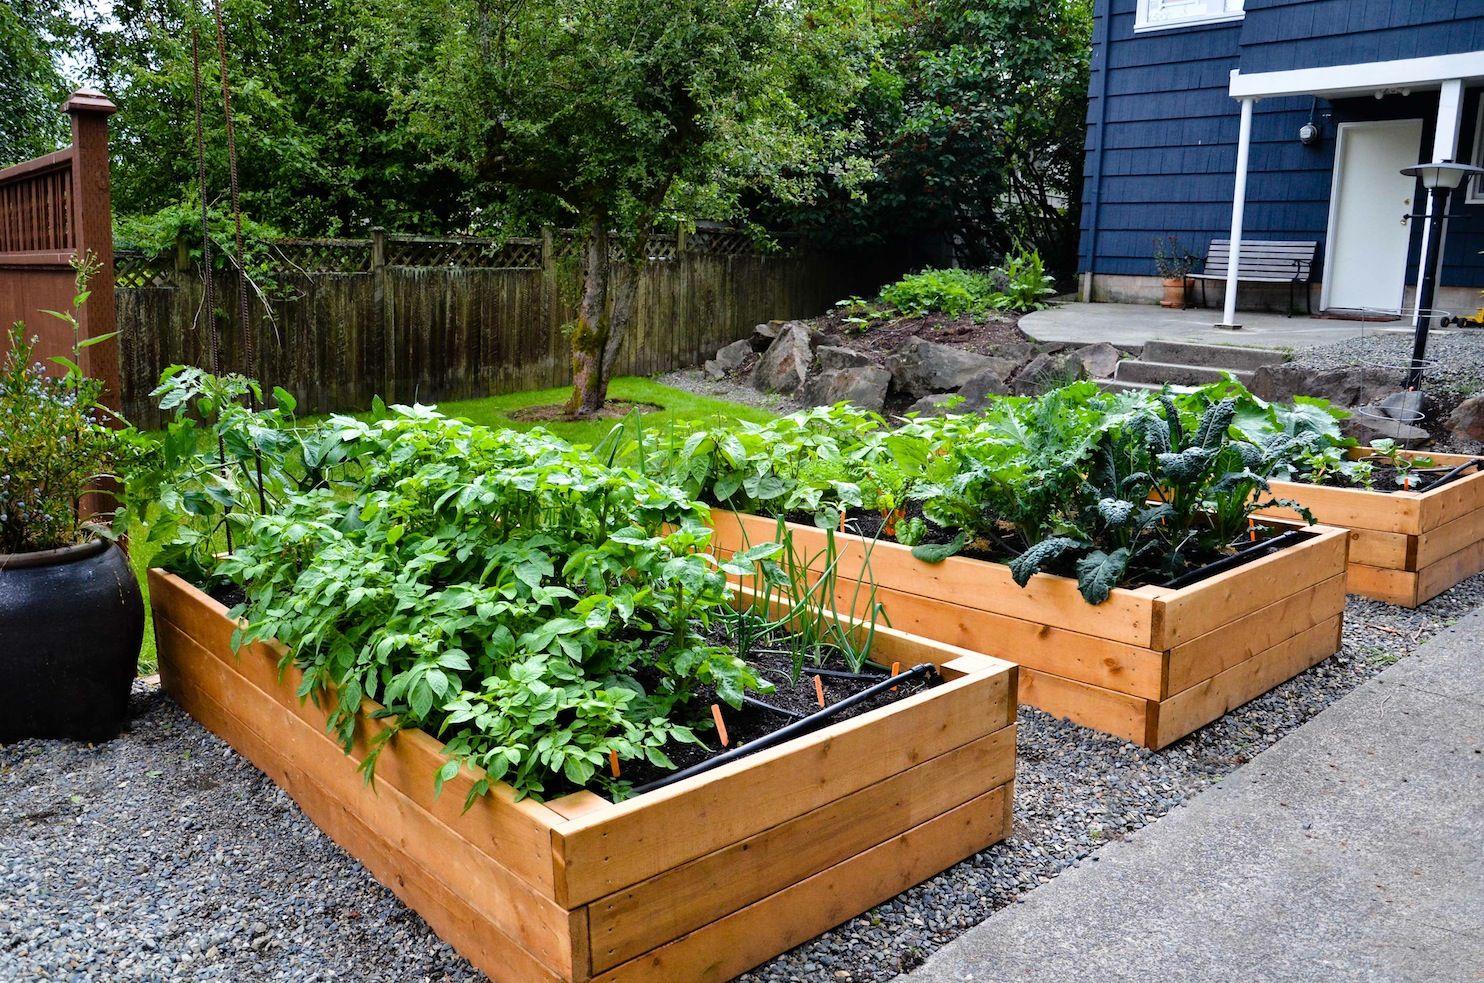 RaisedBed Ideas for Plantation